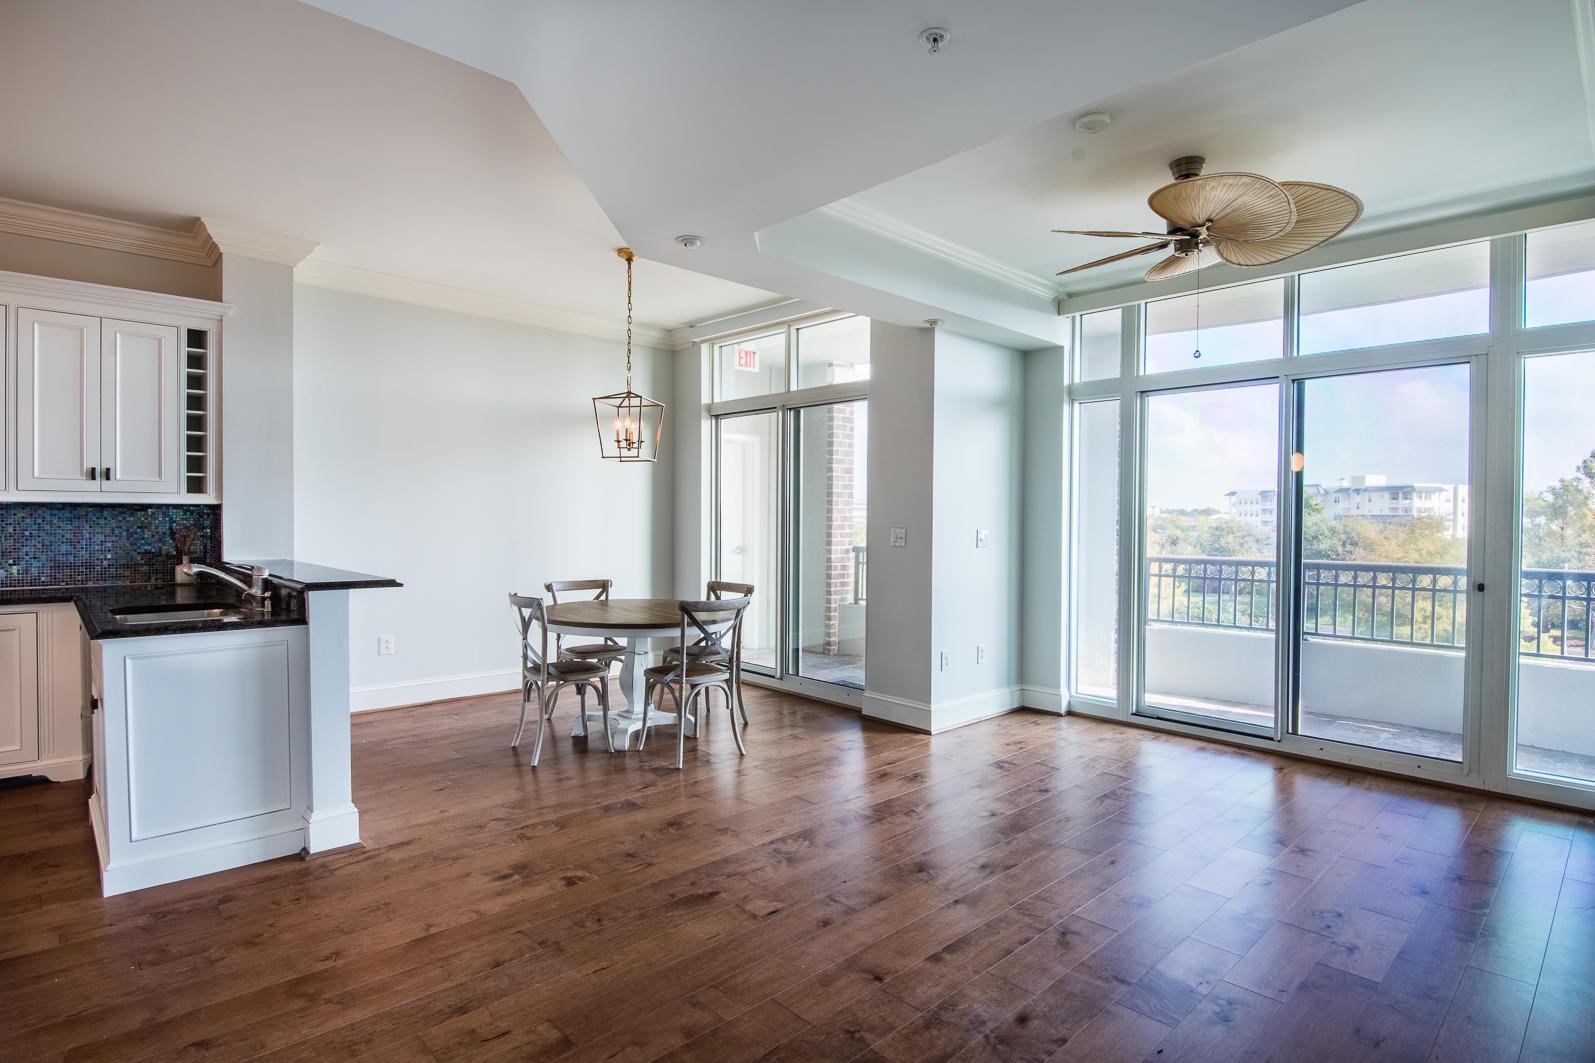 Renaissance On Chas Harbor Homes For Sale - 144 Plaza, Mount Pleasant, SC - 28